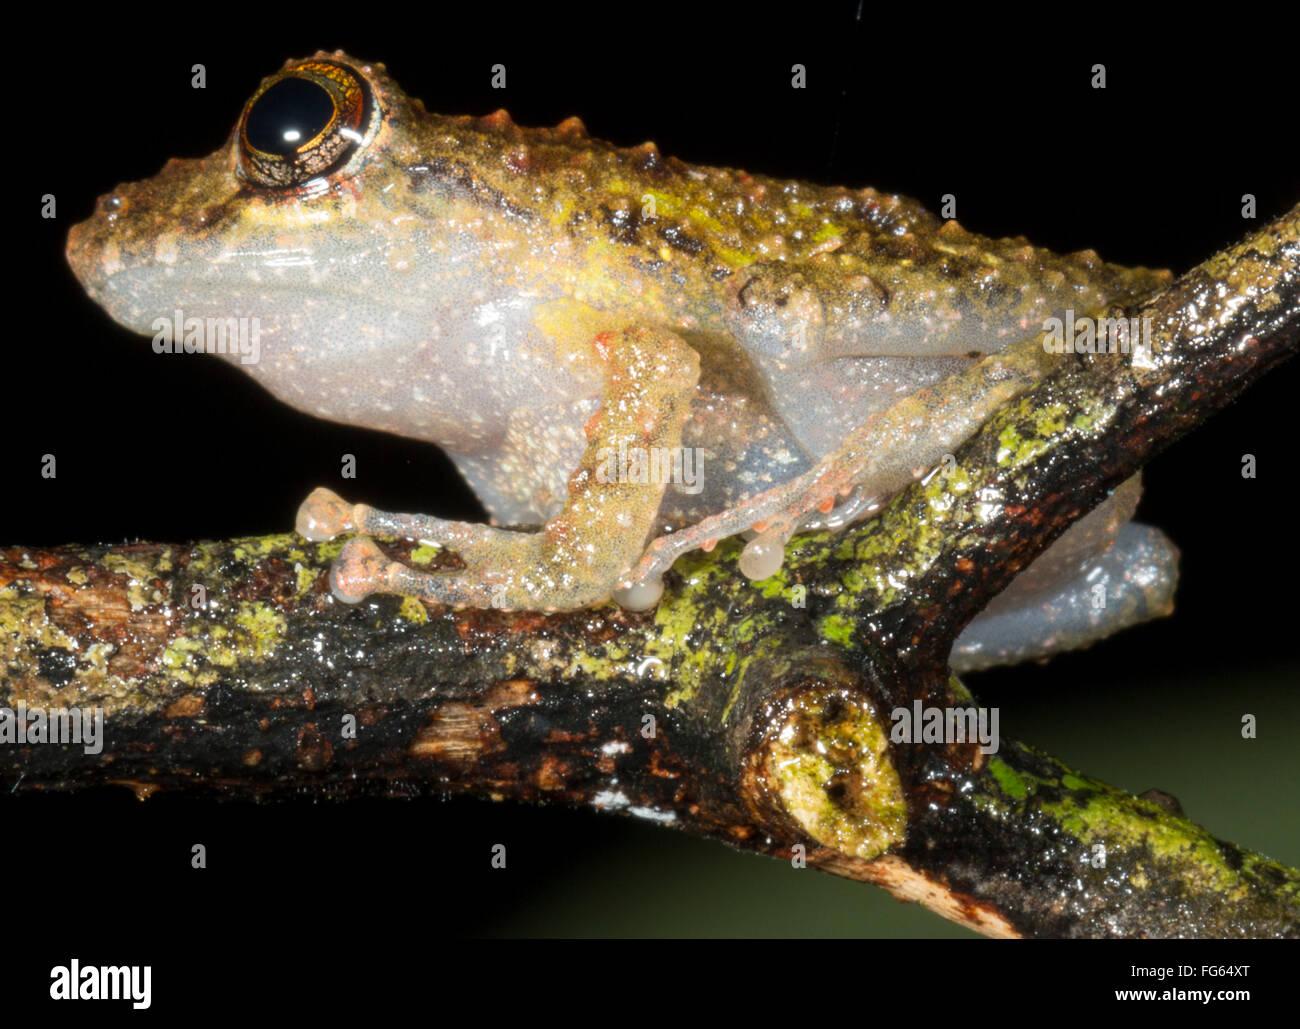 A warty Diadem Rain Frog (Pristimantis diadematus) in rainforest, Pastaza province, Ecuador - Stock Image